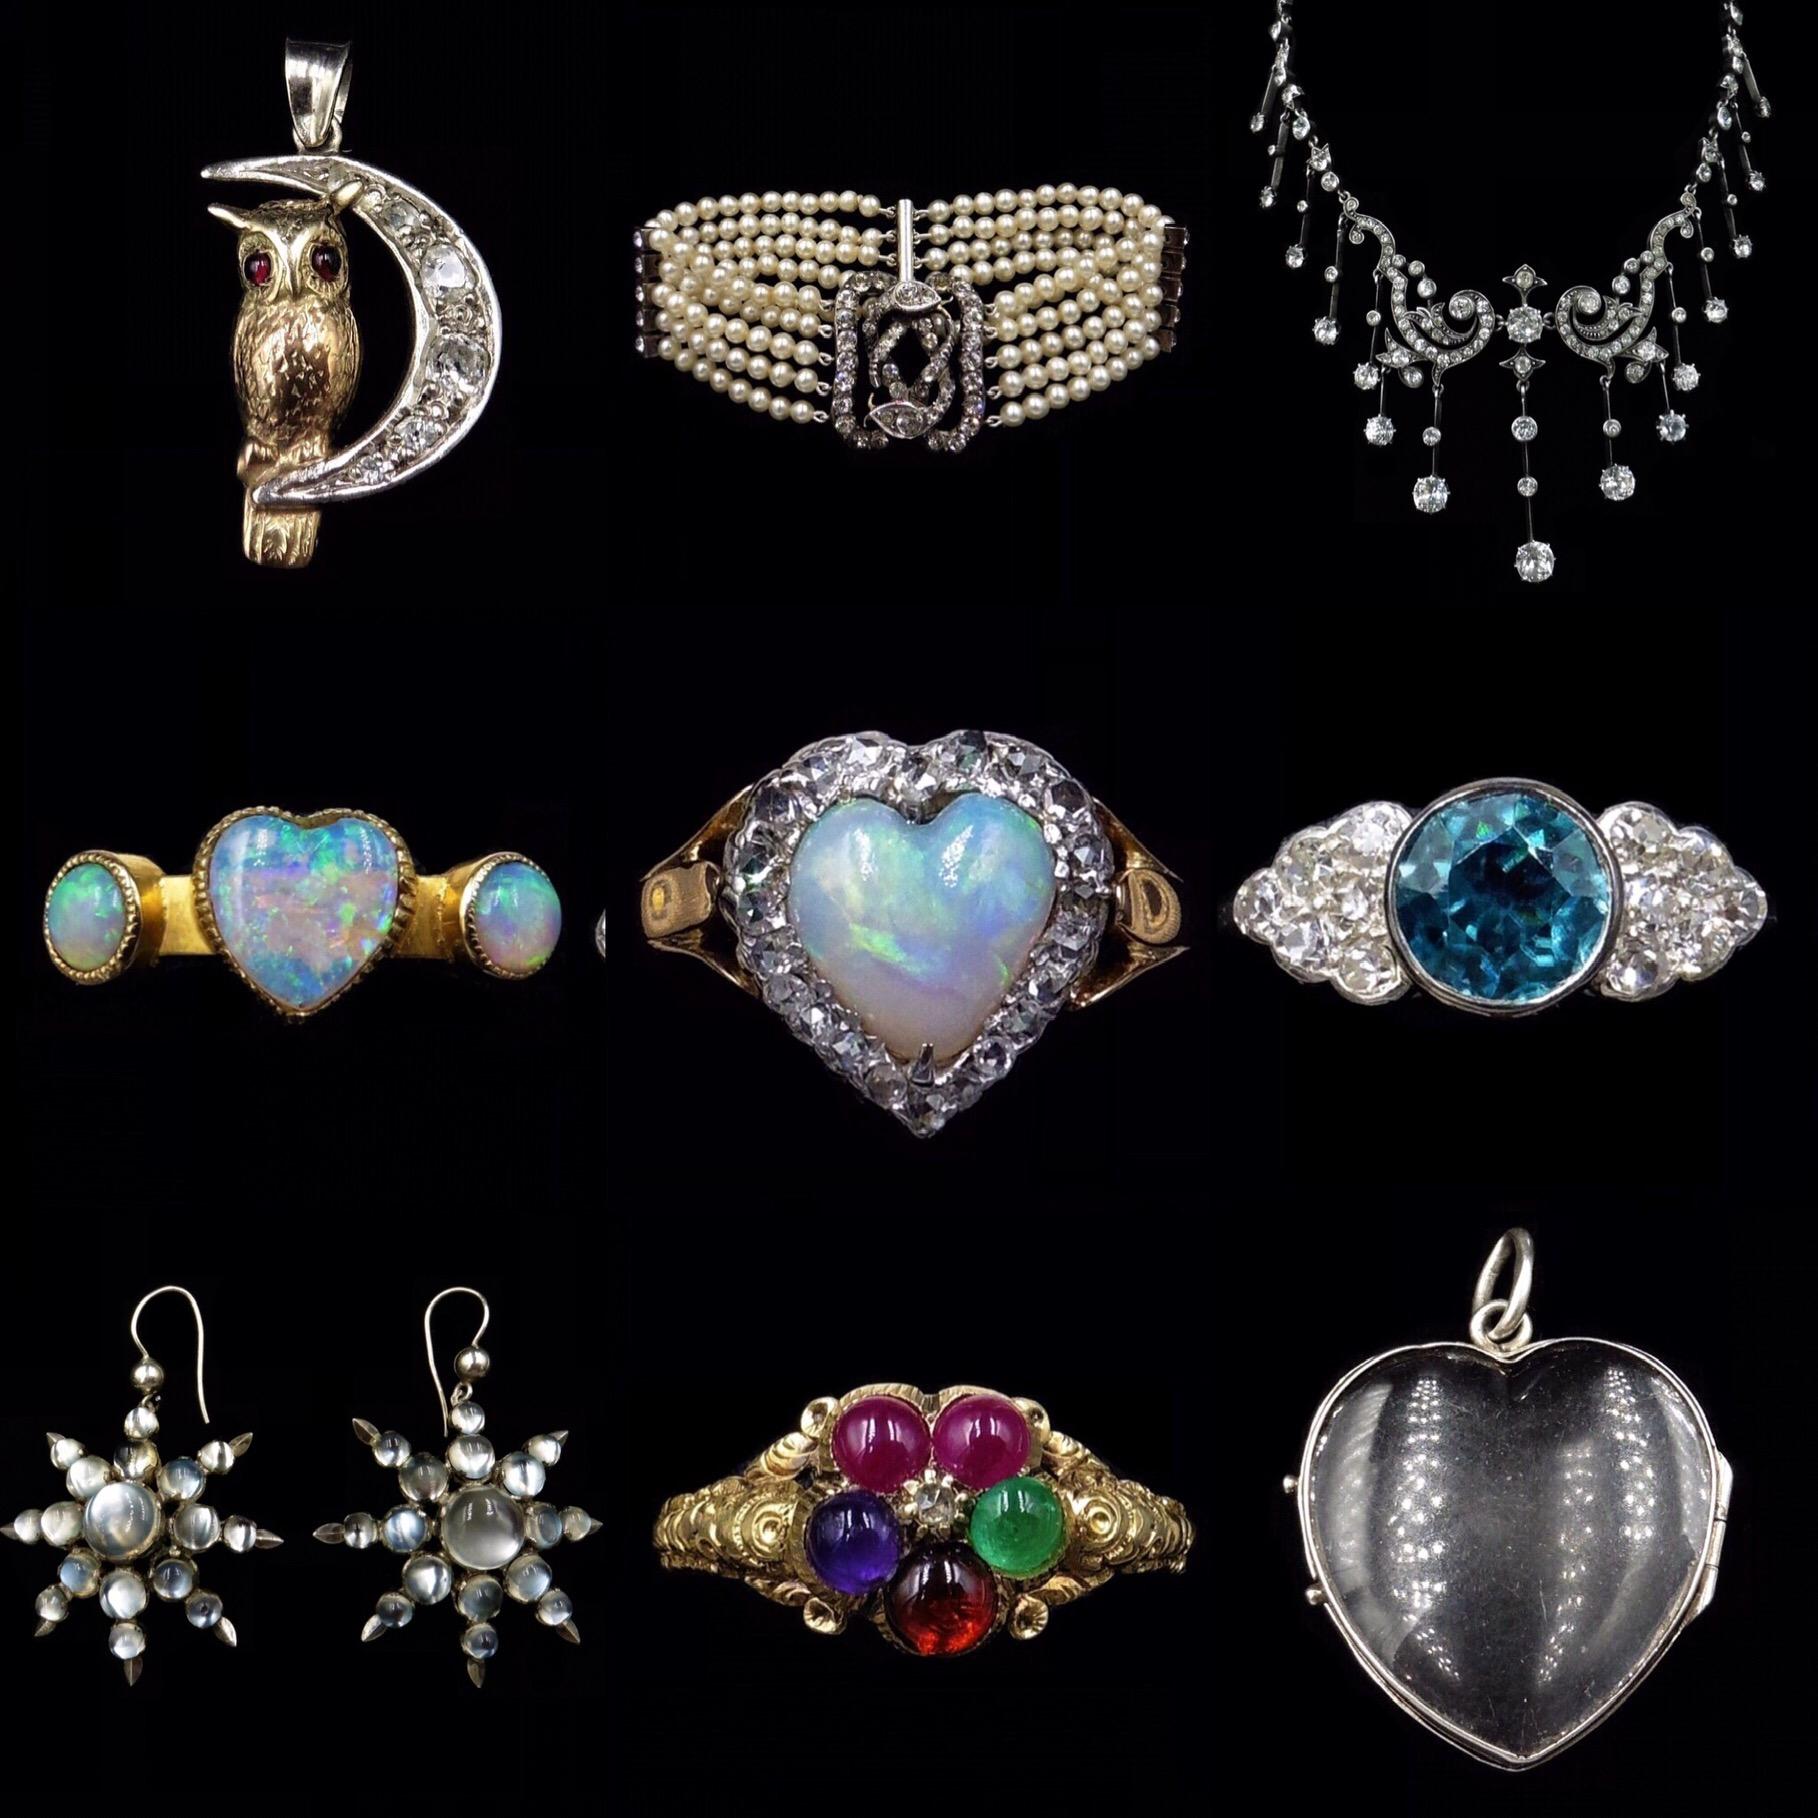 Lancastrian Jewellers image (4 of 6)